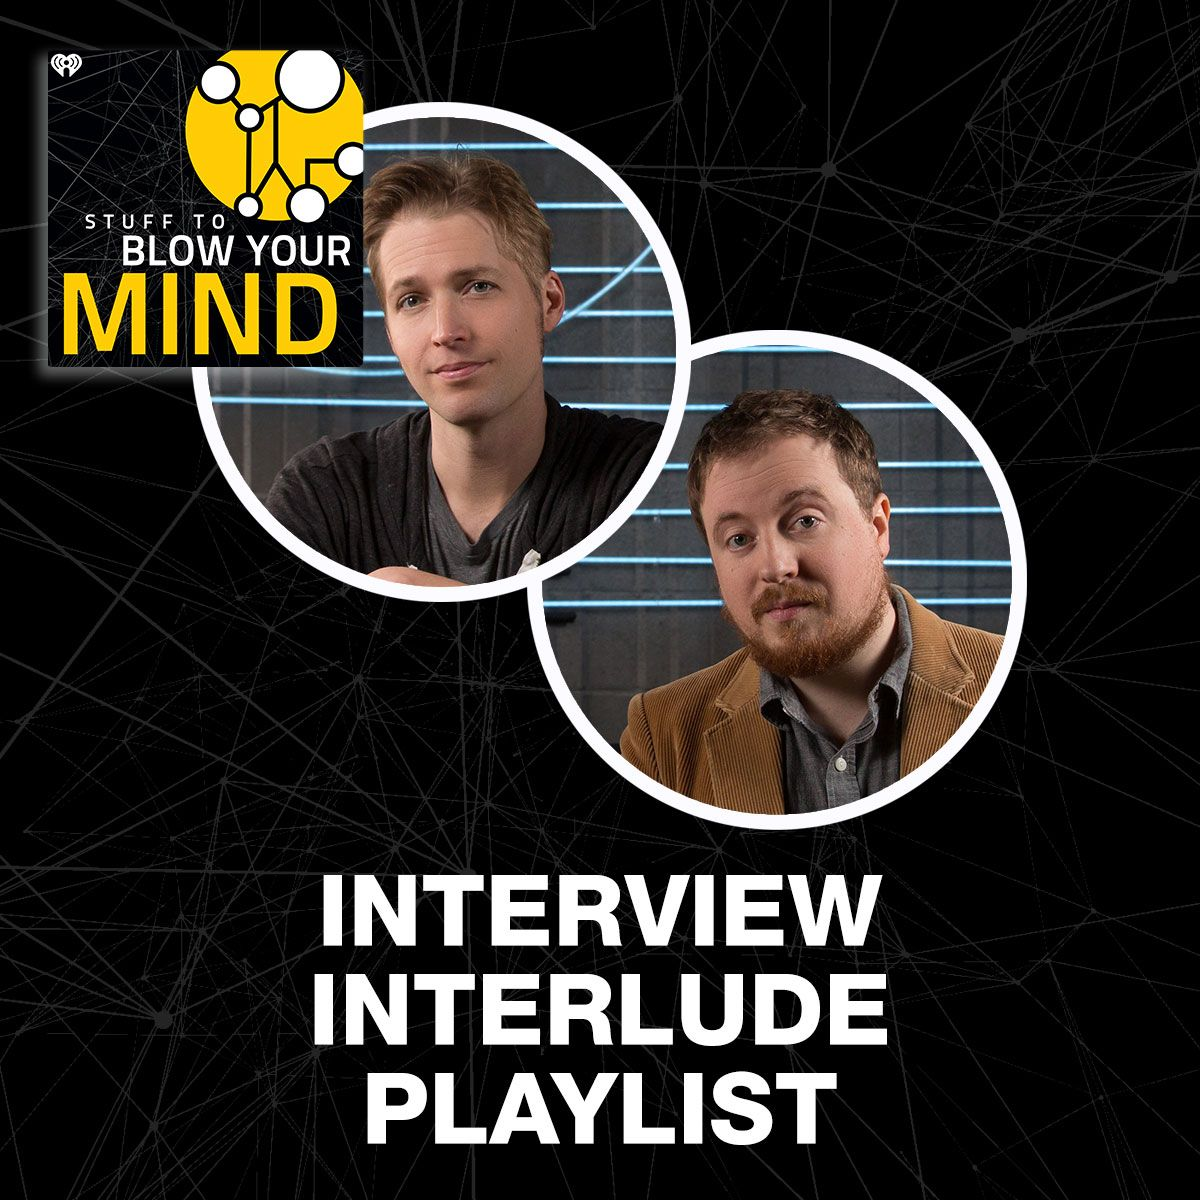 Interview Interlude Playlist, Part 8: Marah Hardt